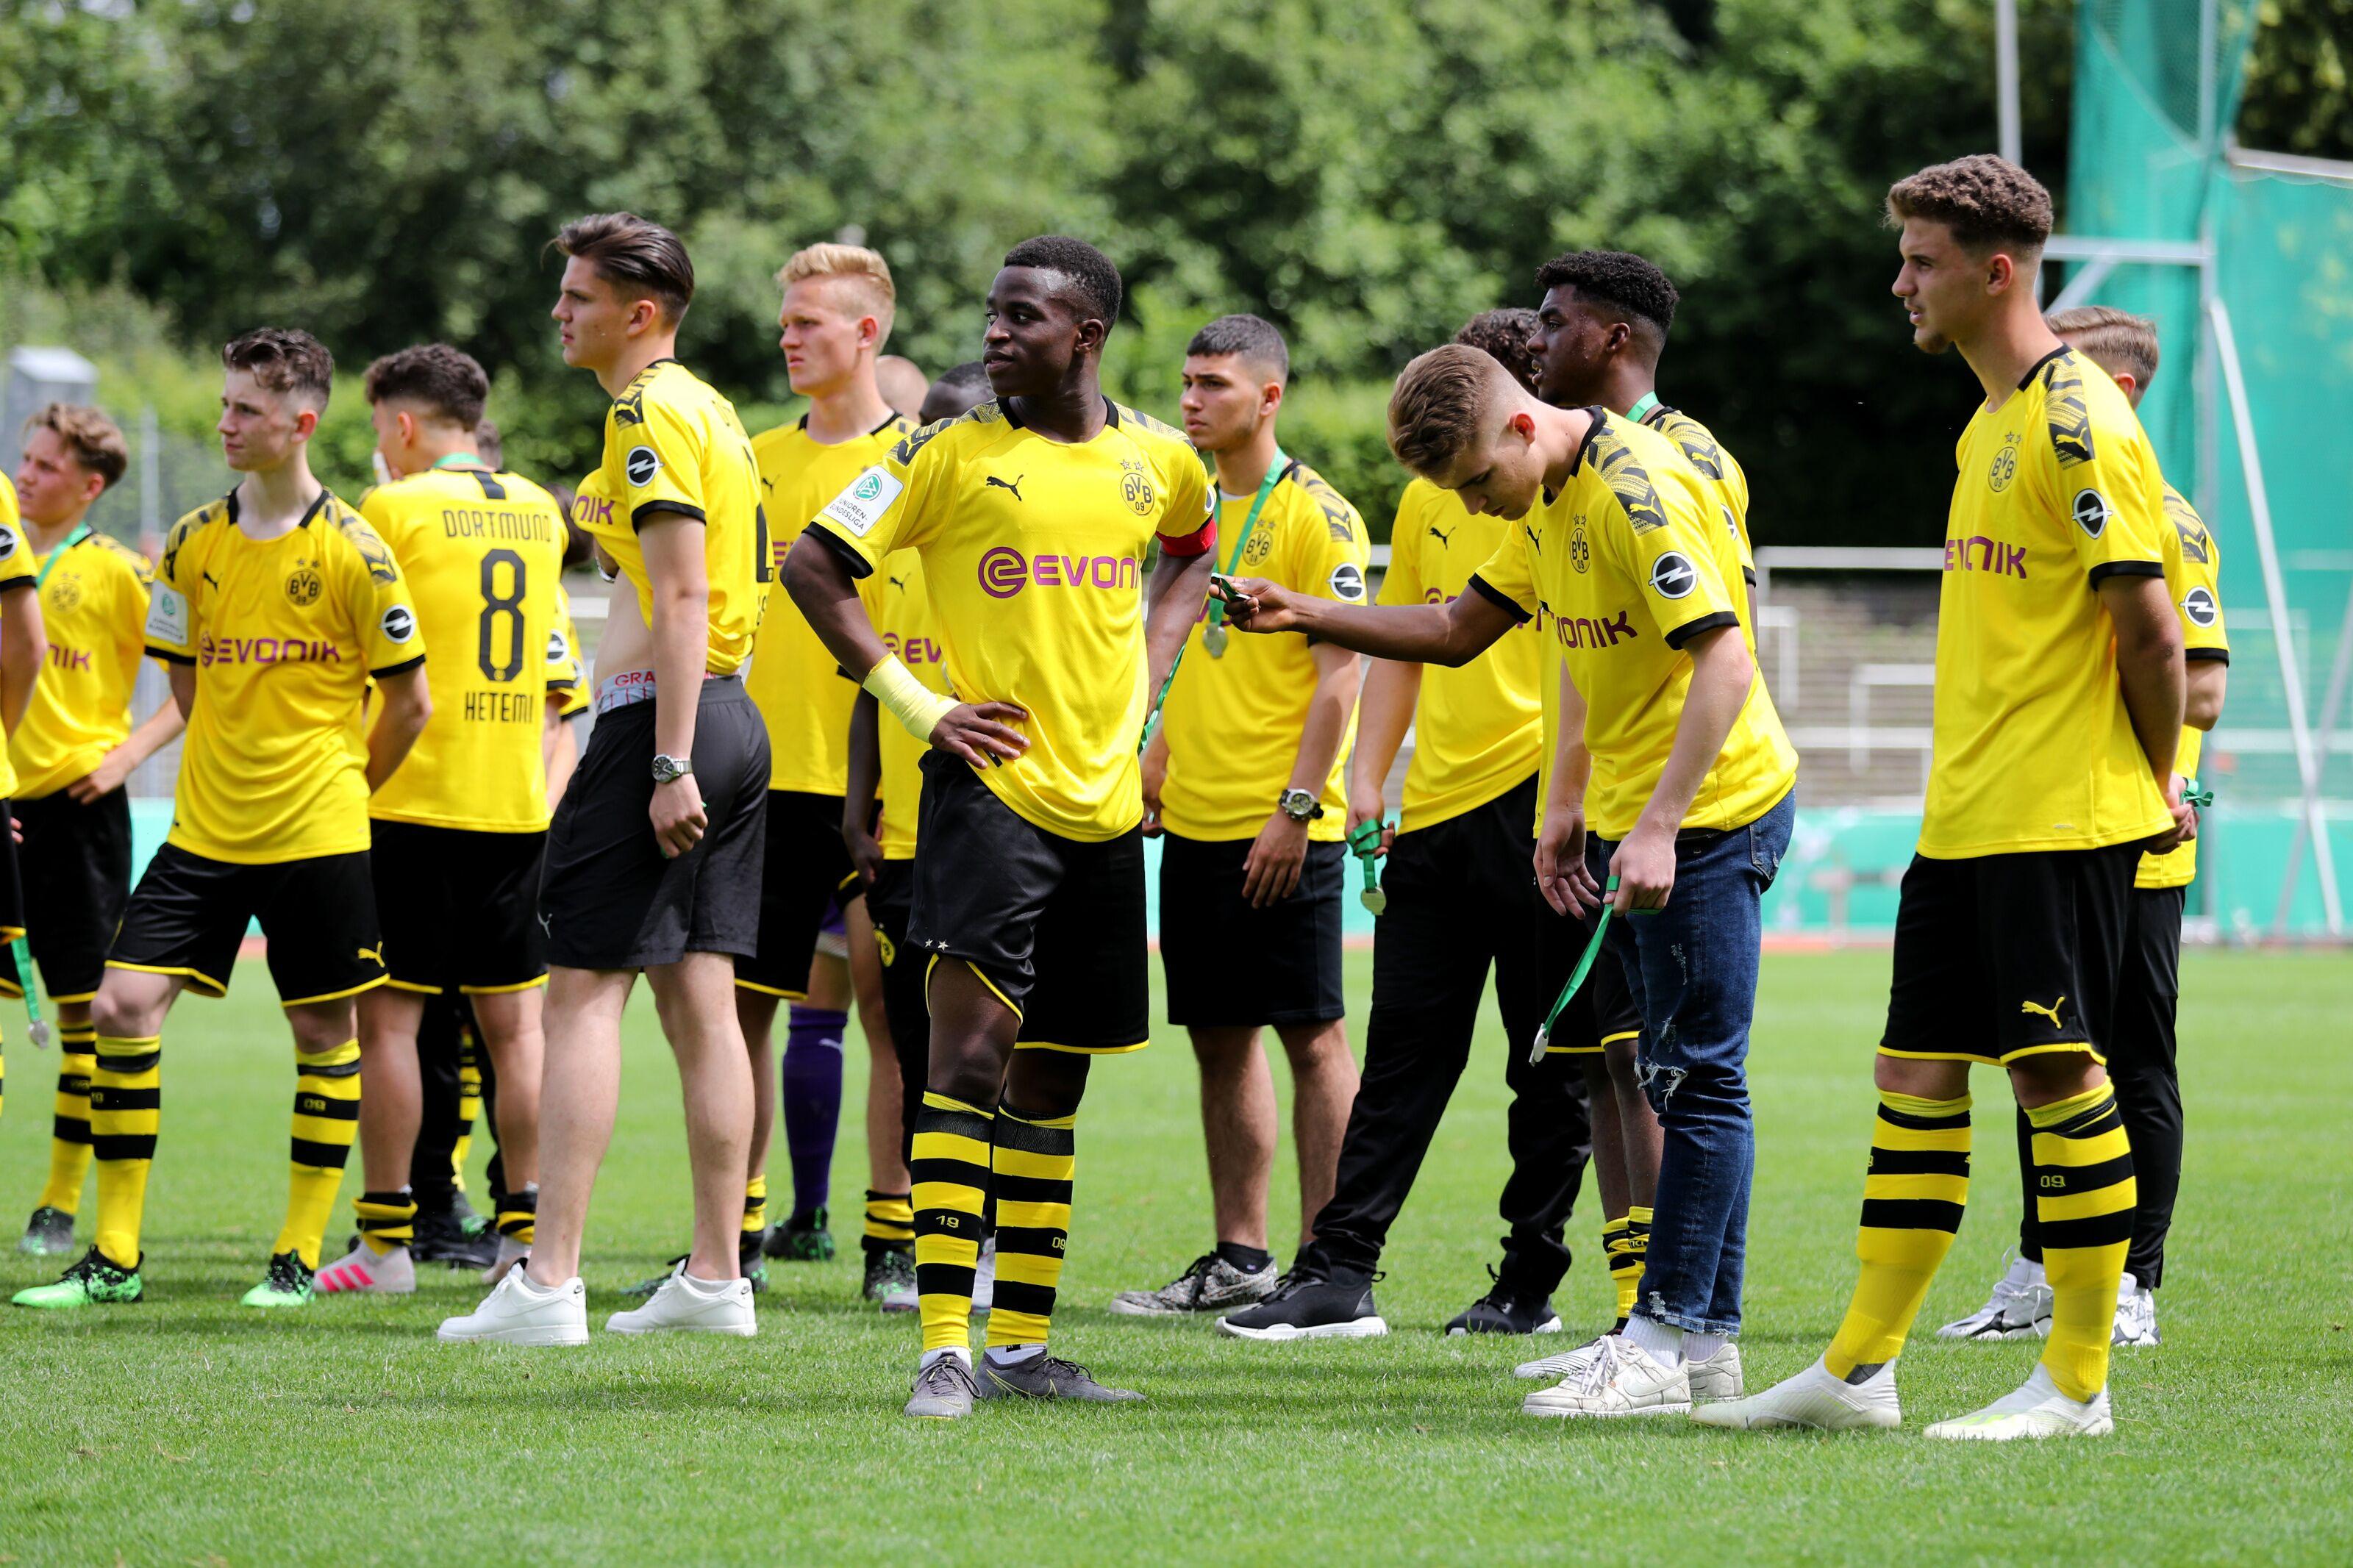 Borussia Bocholt U17